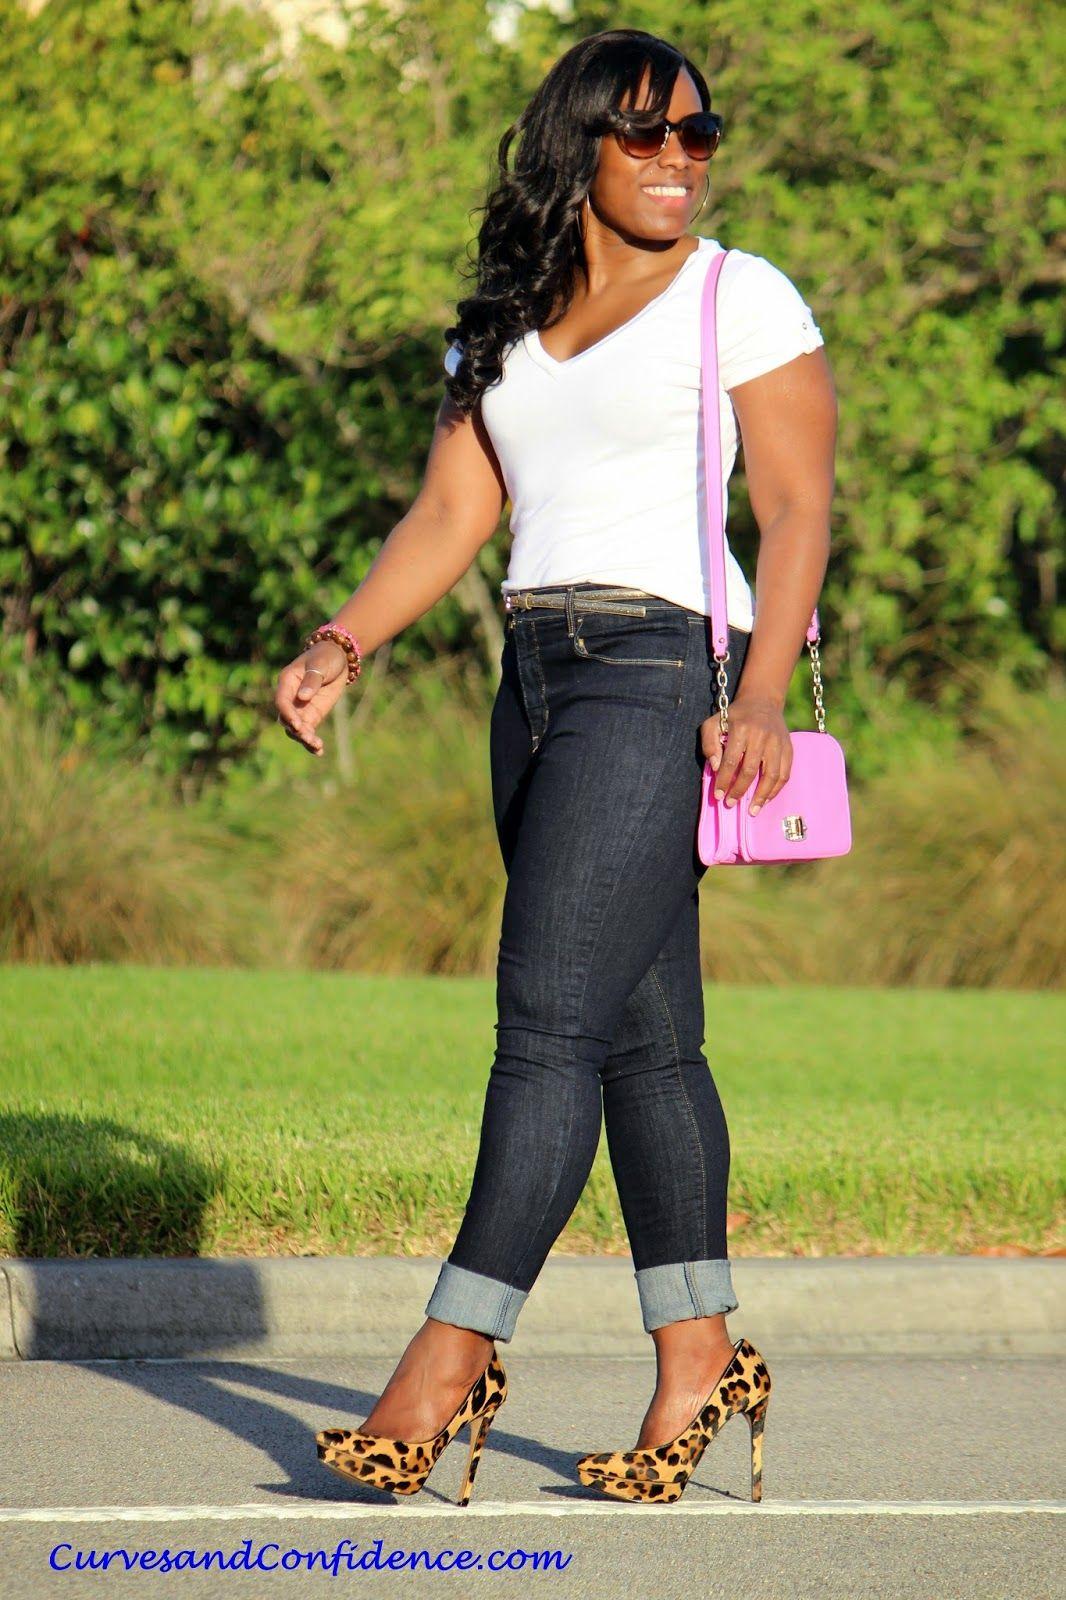 Weekend Wear: High-Waist Jeans